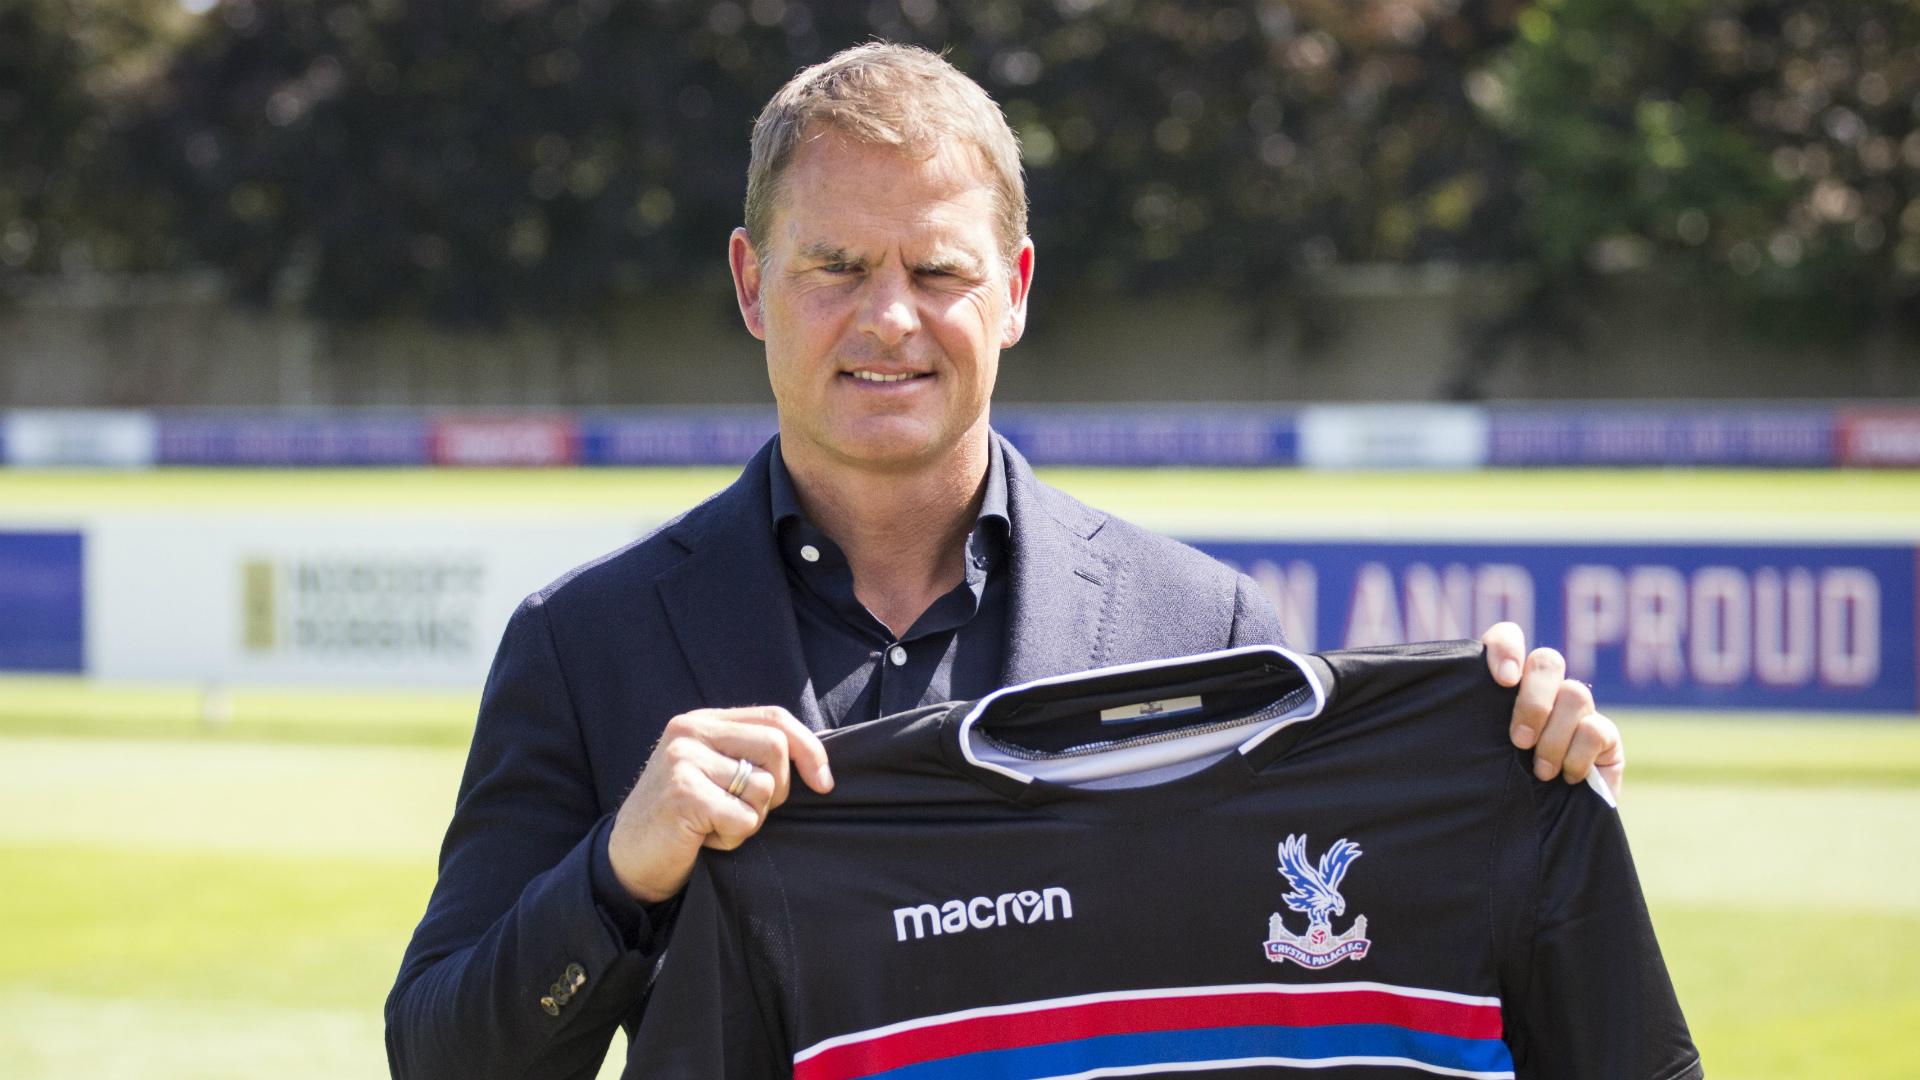 Crystal Palace, entrenador, récord, negativo, destituido, Premier league, Frank de Boer